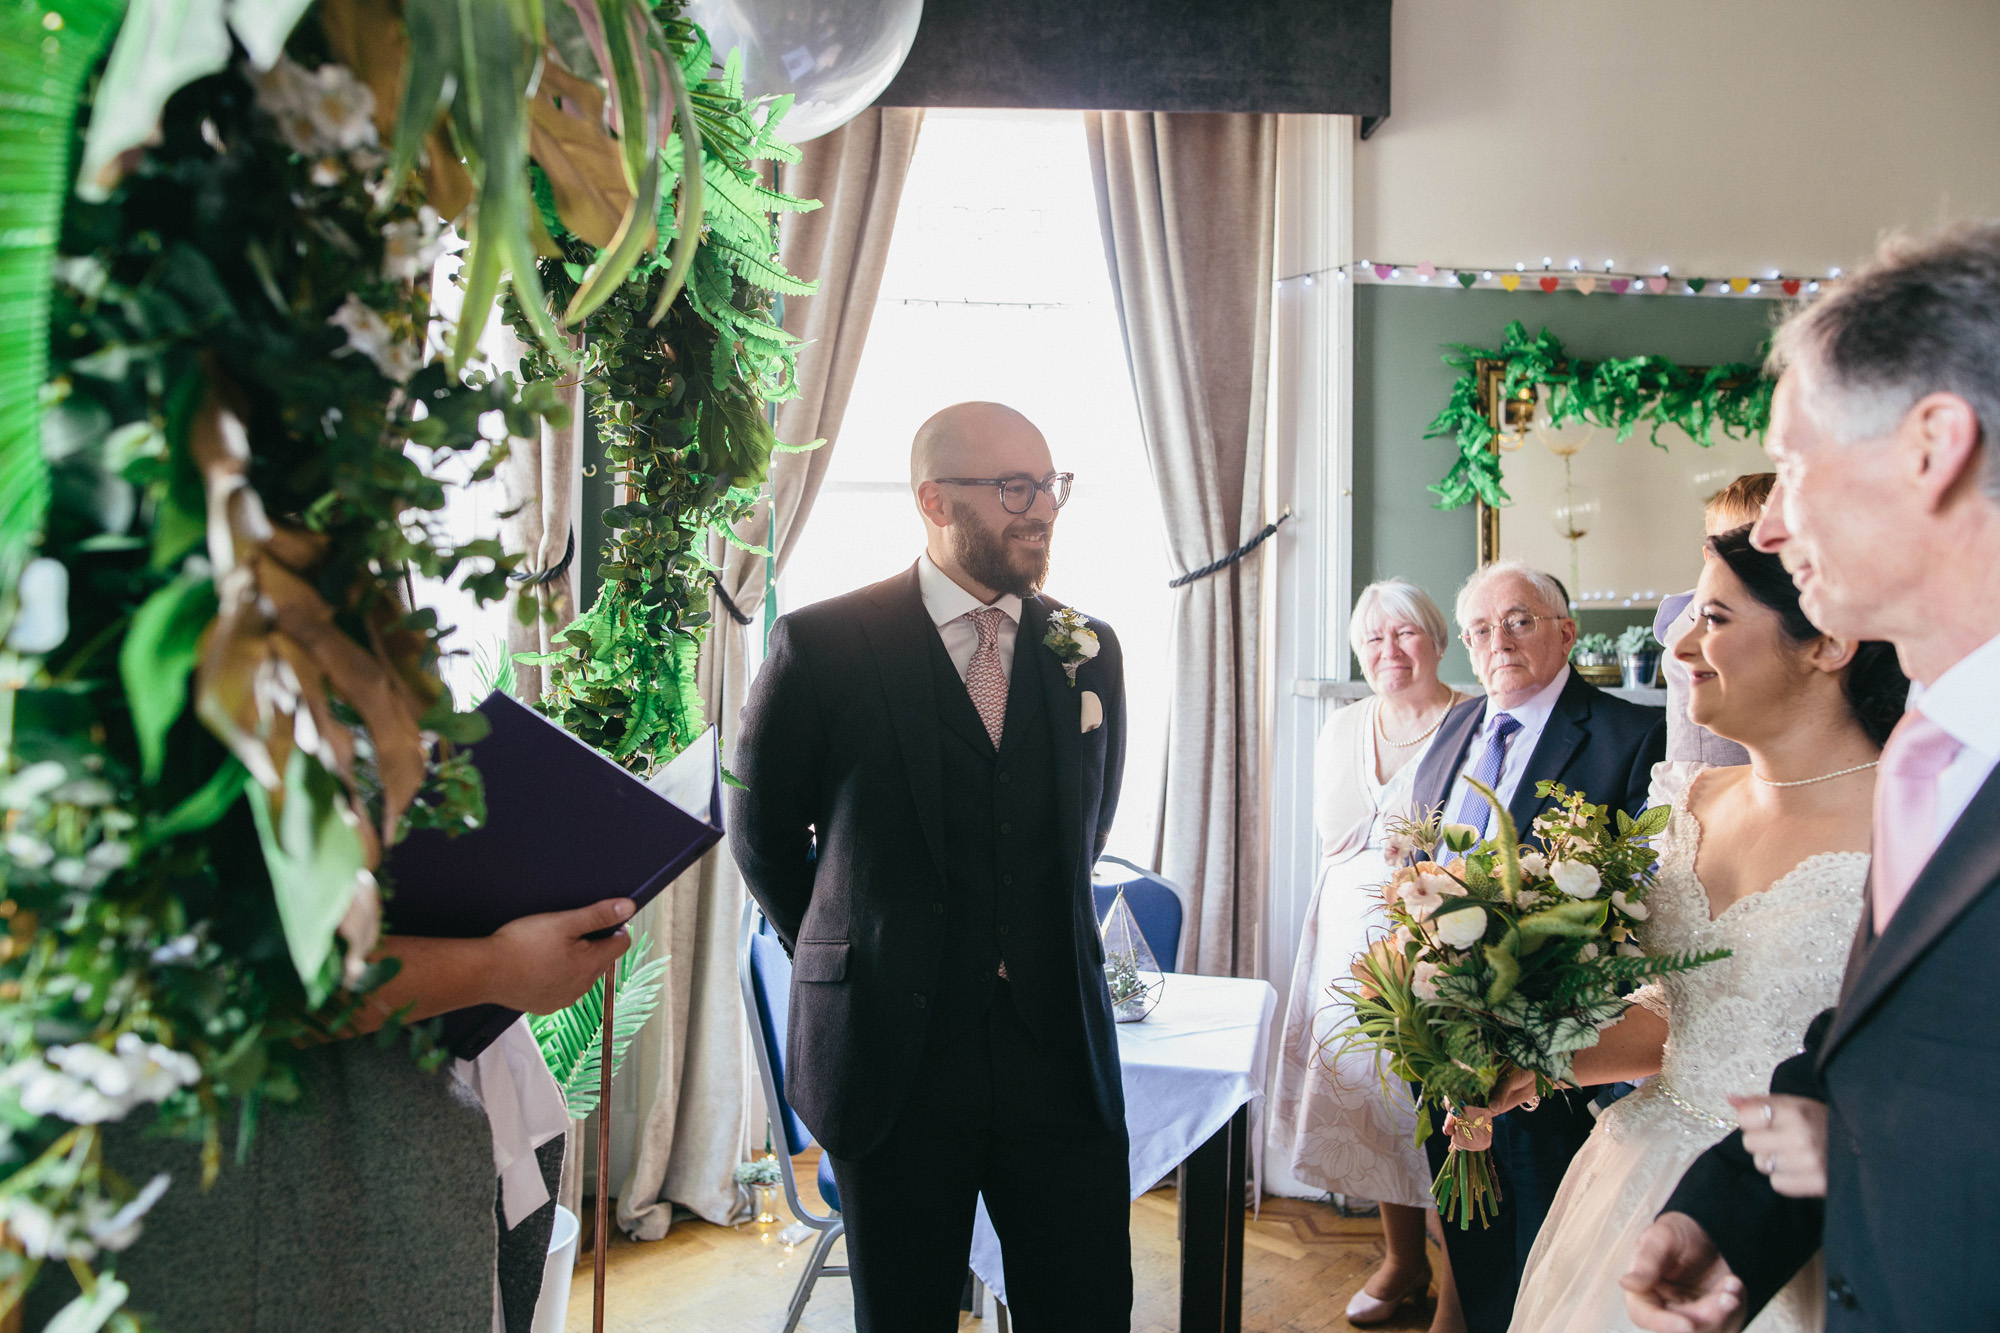 Quirky Wedding Photography Glasgow West End 024.jpg